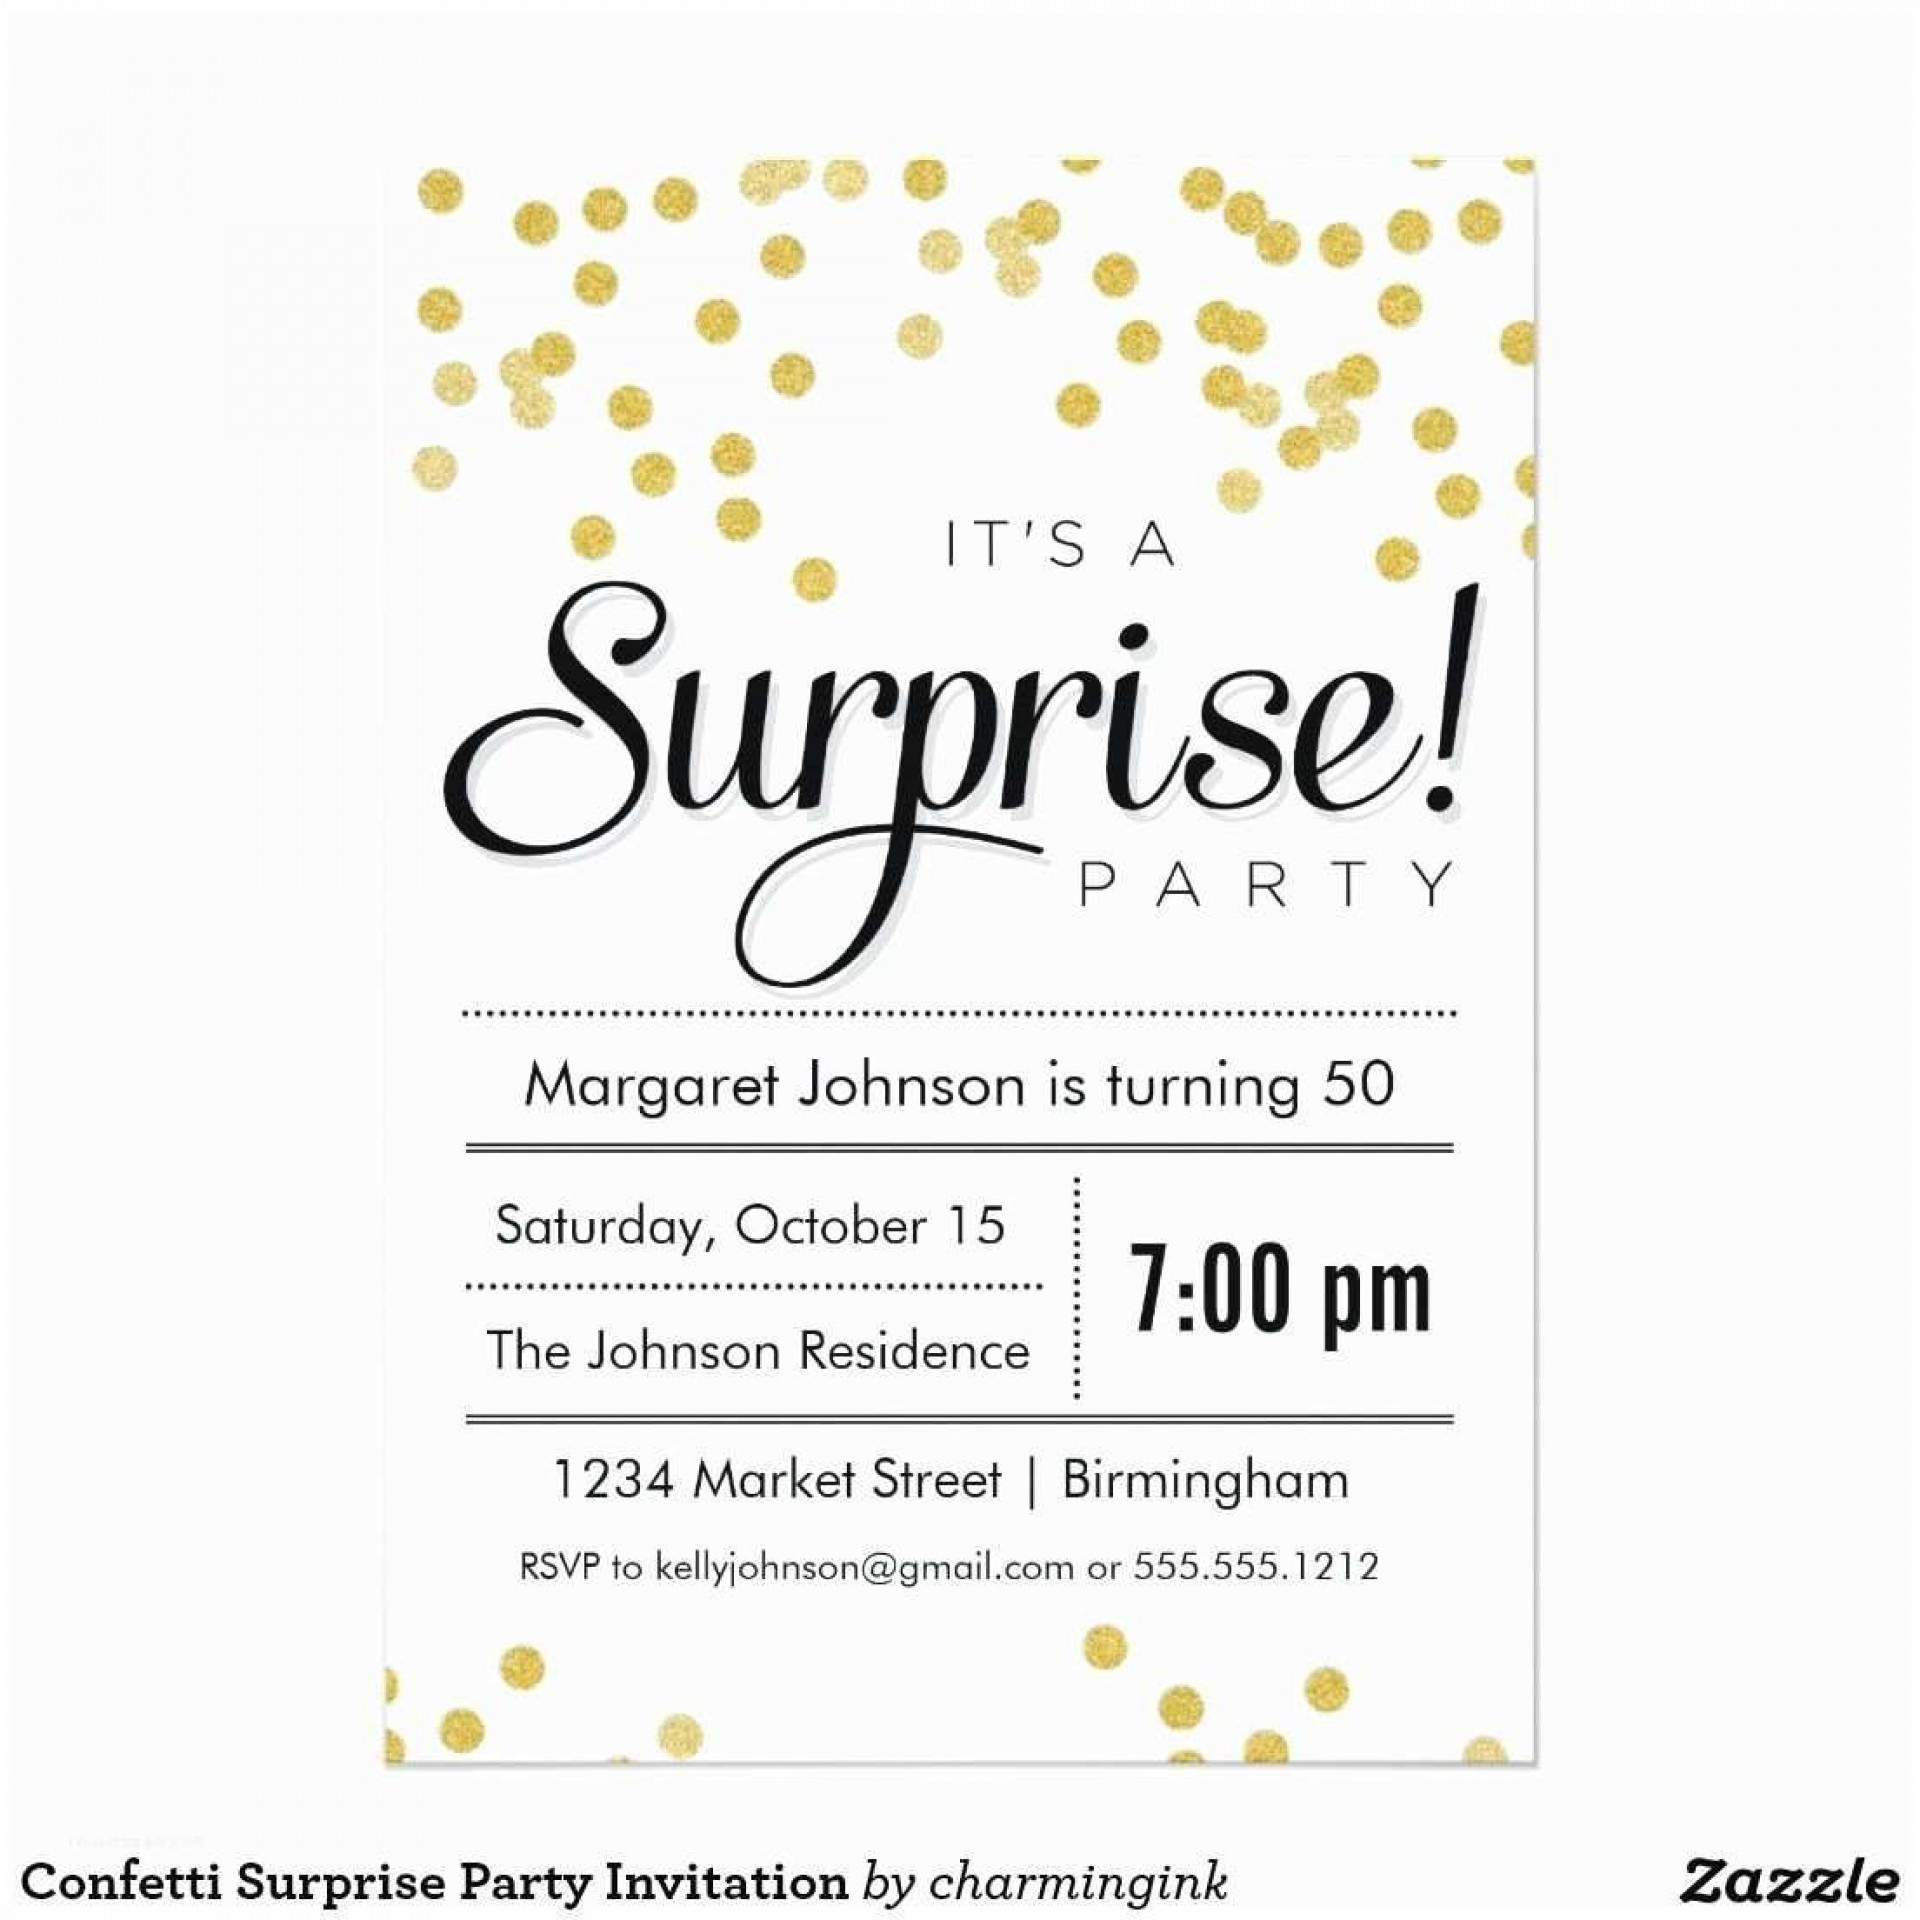 004 Stunning Free Birthday Party Invitation Template Sample  Templates Printable 16th Australia Uk1920